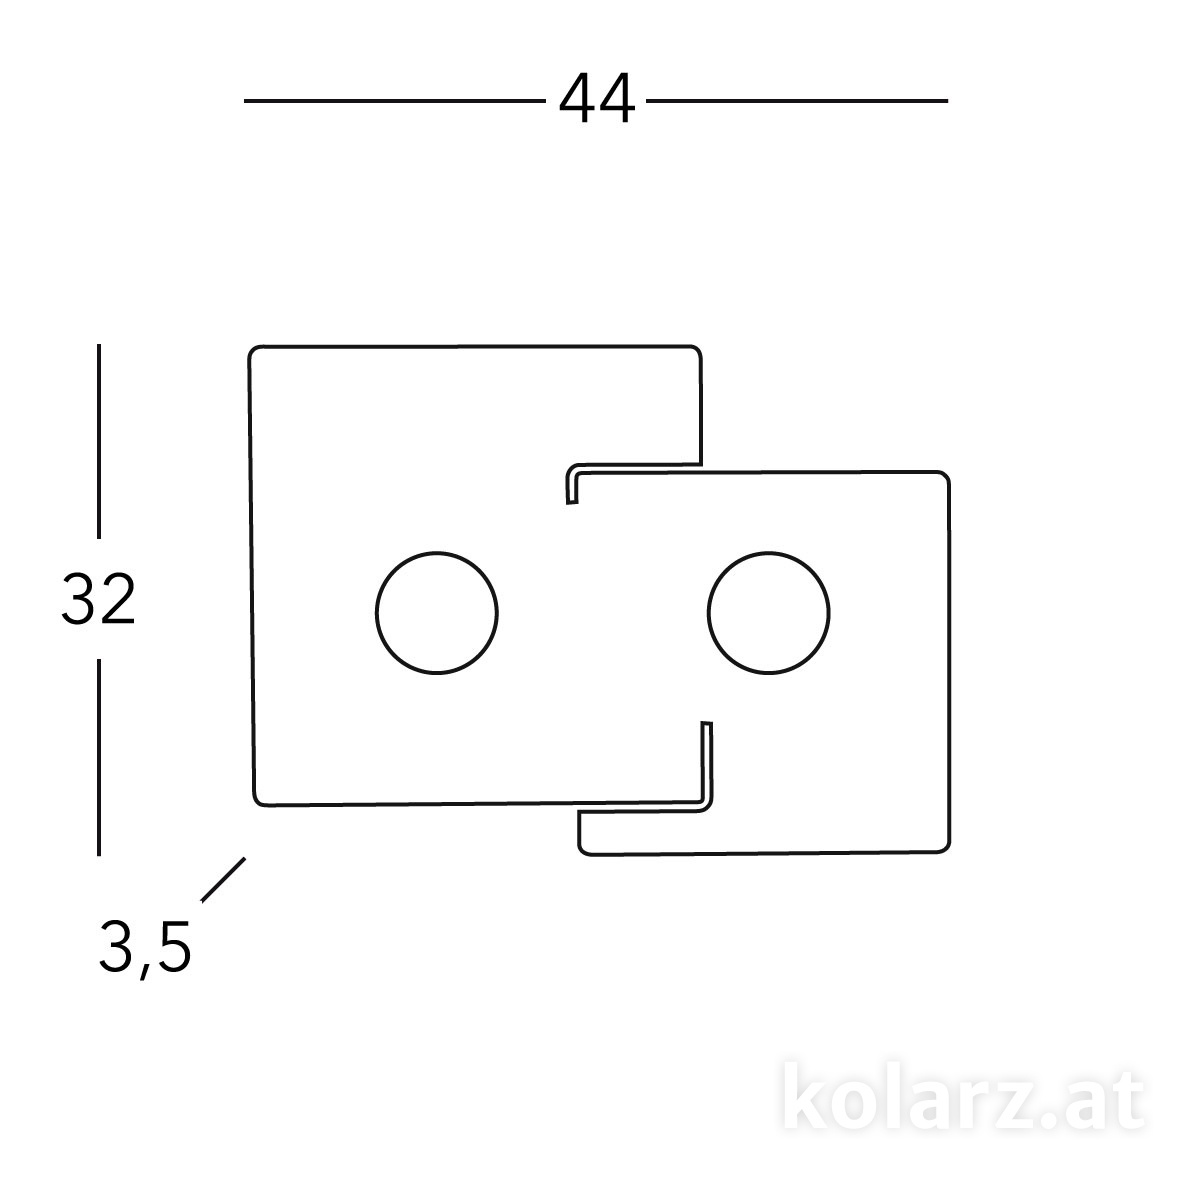 A1337-12-1-Cu-s1.jpg